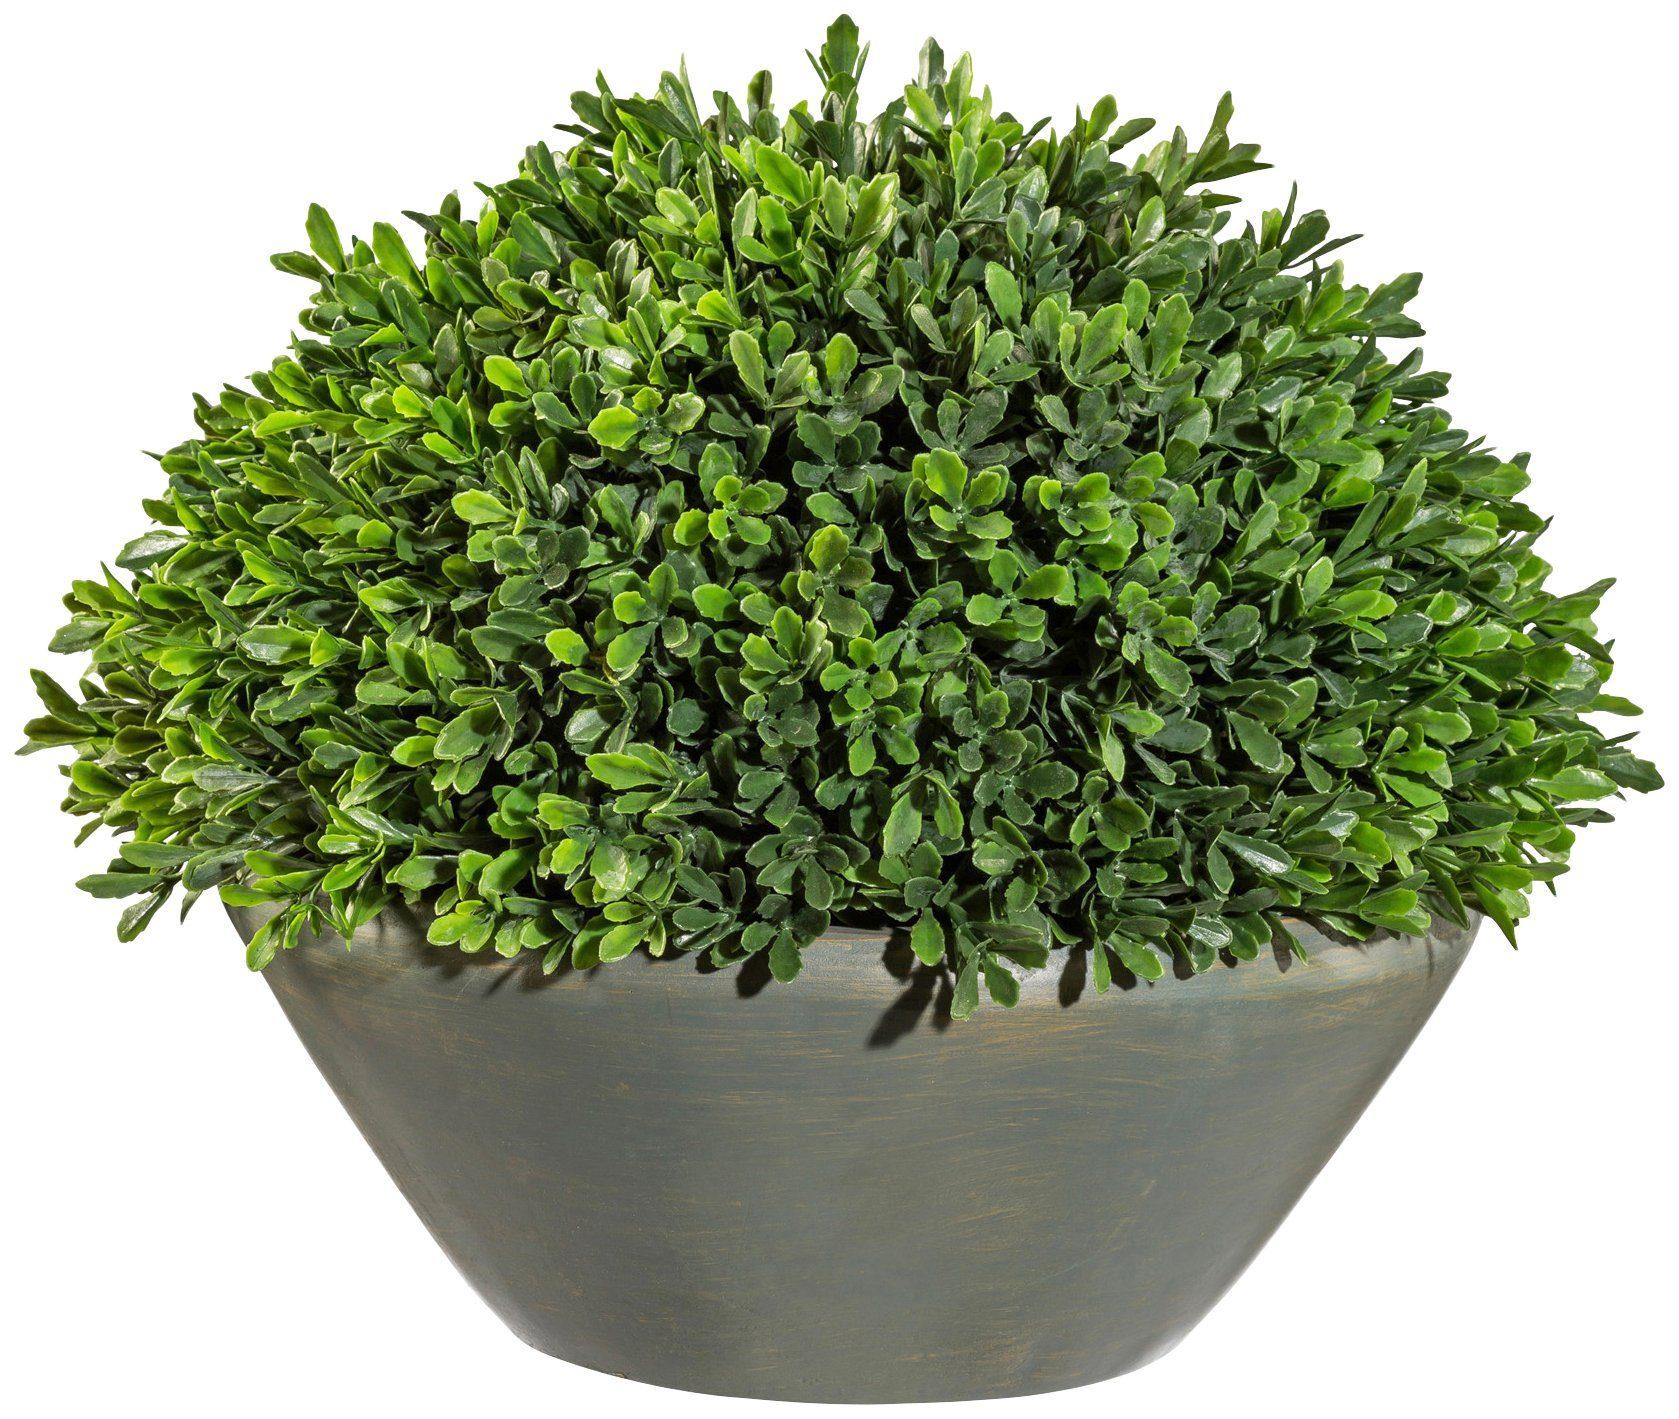 Kunstpflanze »Buchsbaum Halbkugel«, im Zementtopf, Höhe 28 cm